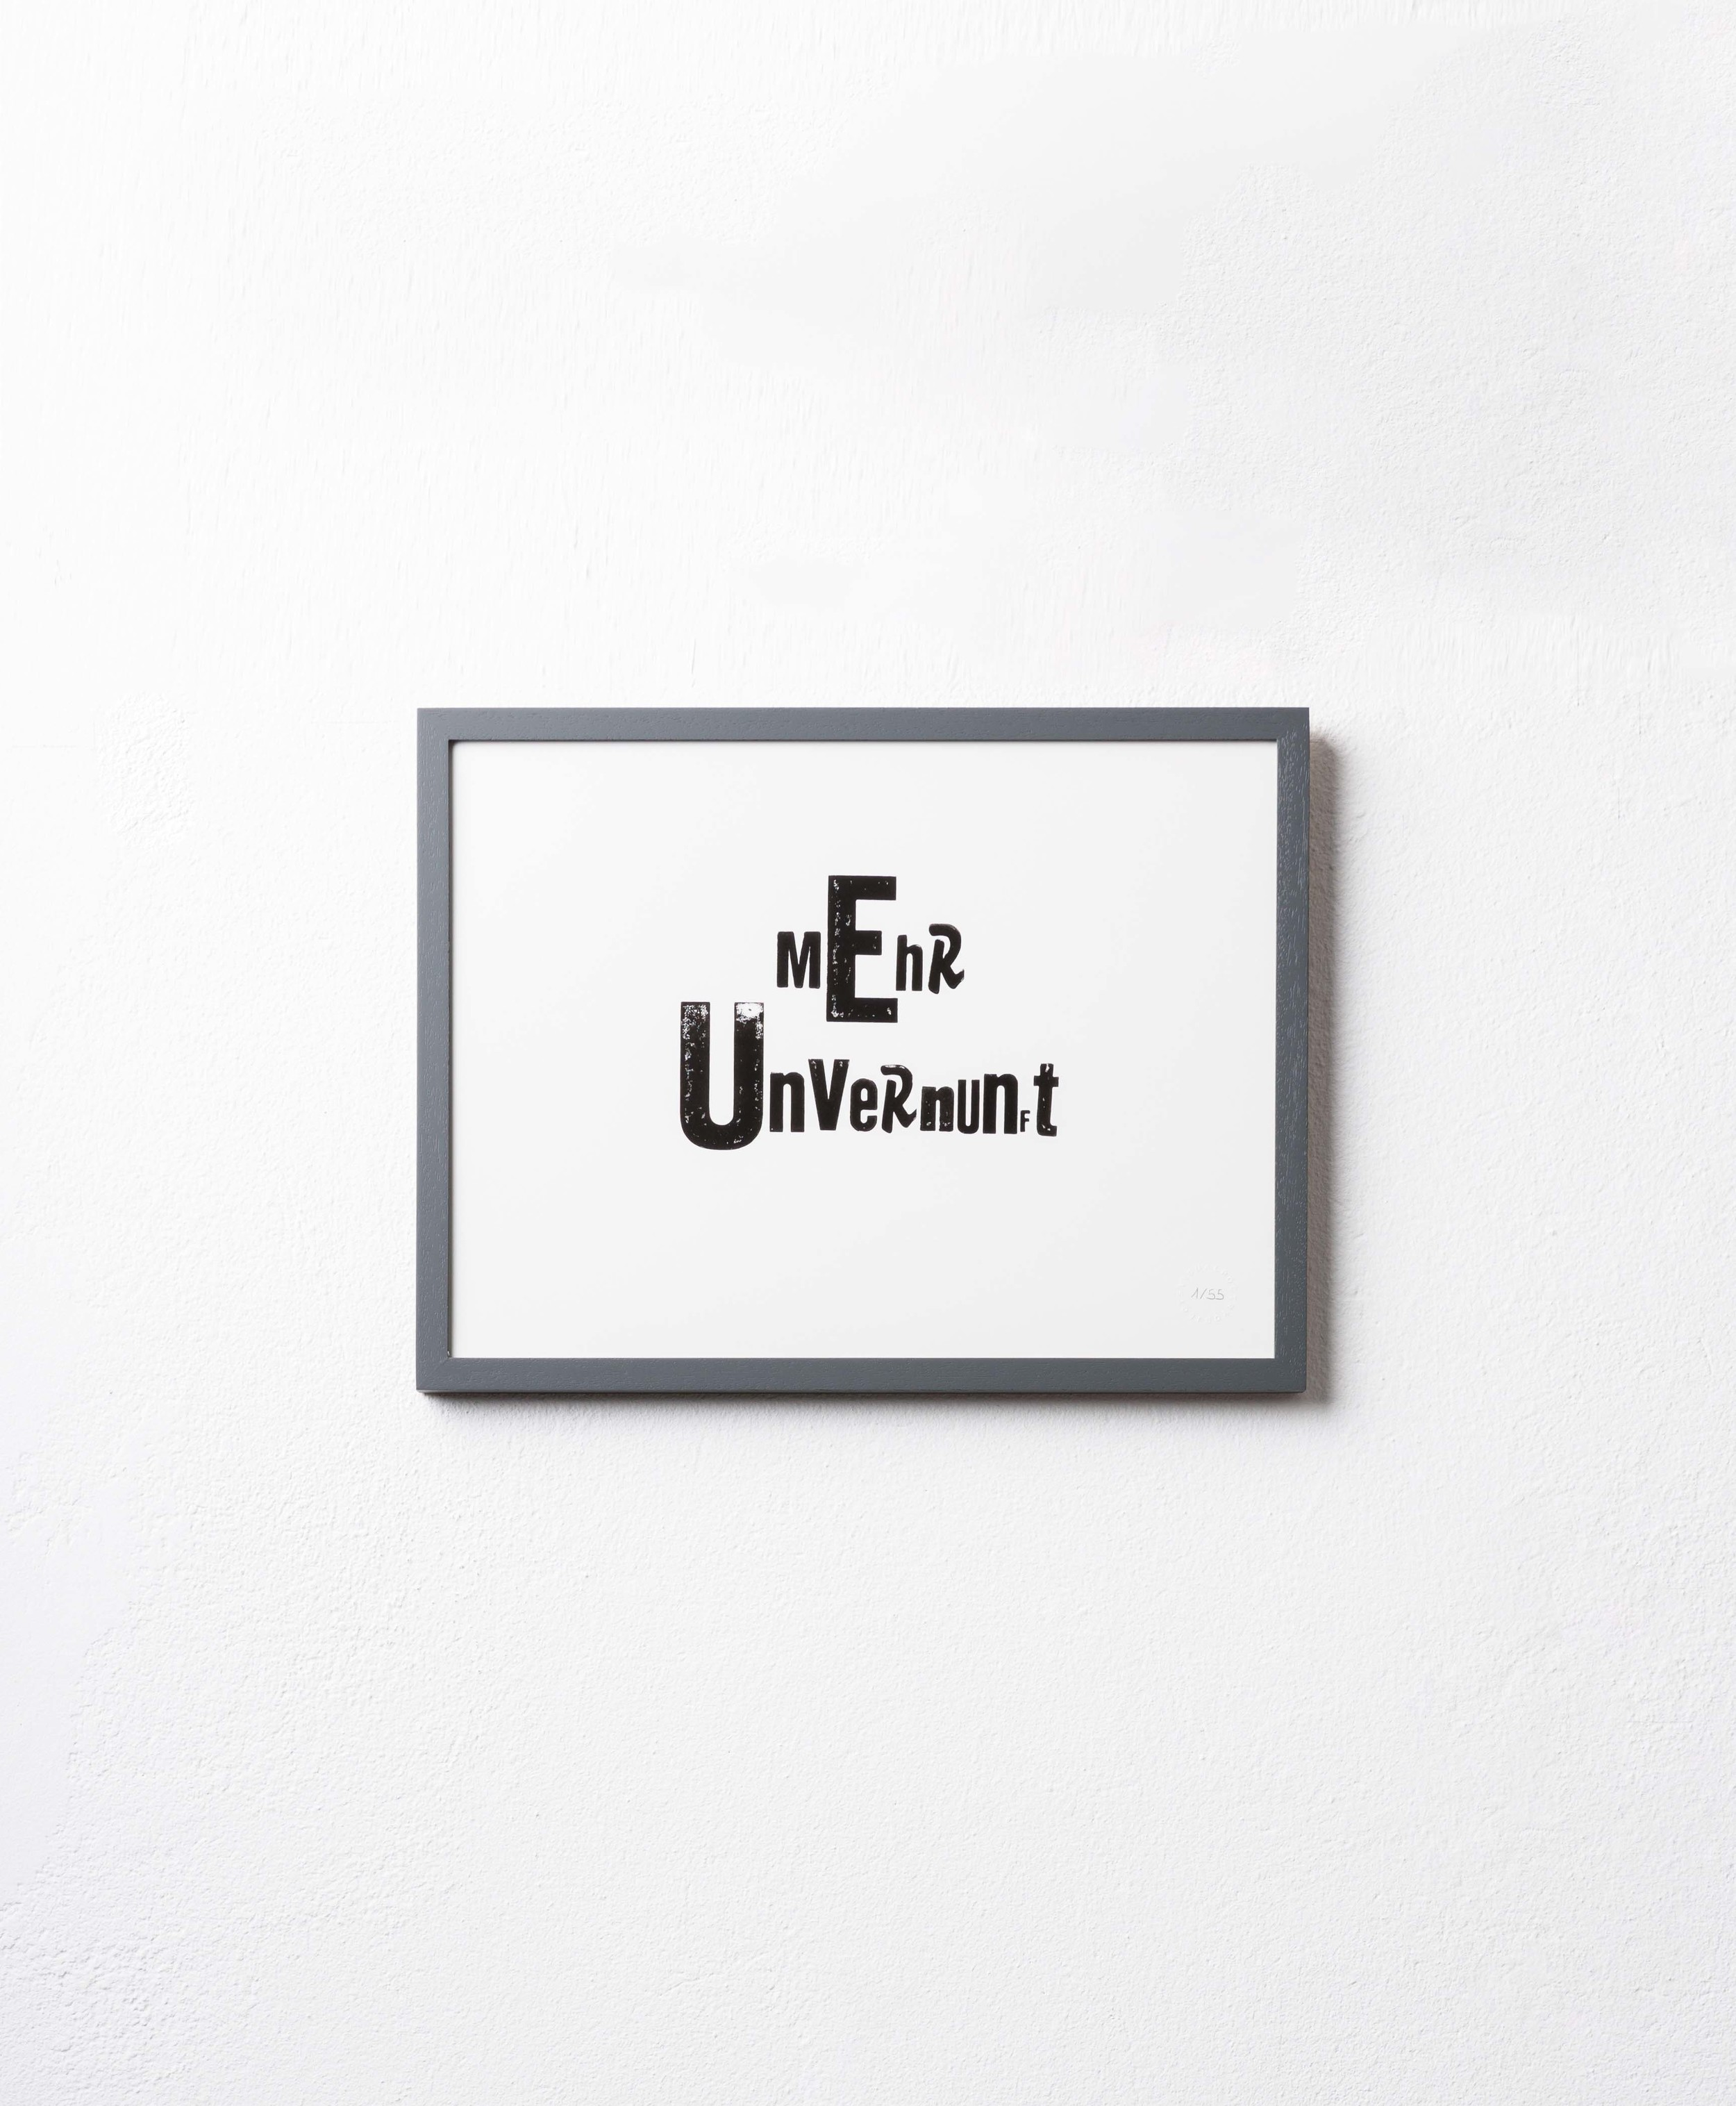 UNVERNUNFT Limited Edition Print / Handgestempelt / 30 x 40   65 EUR